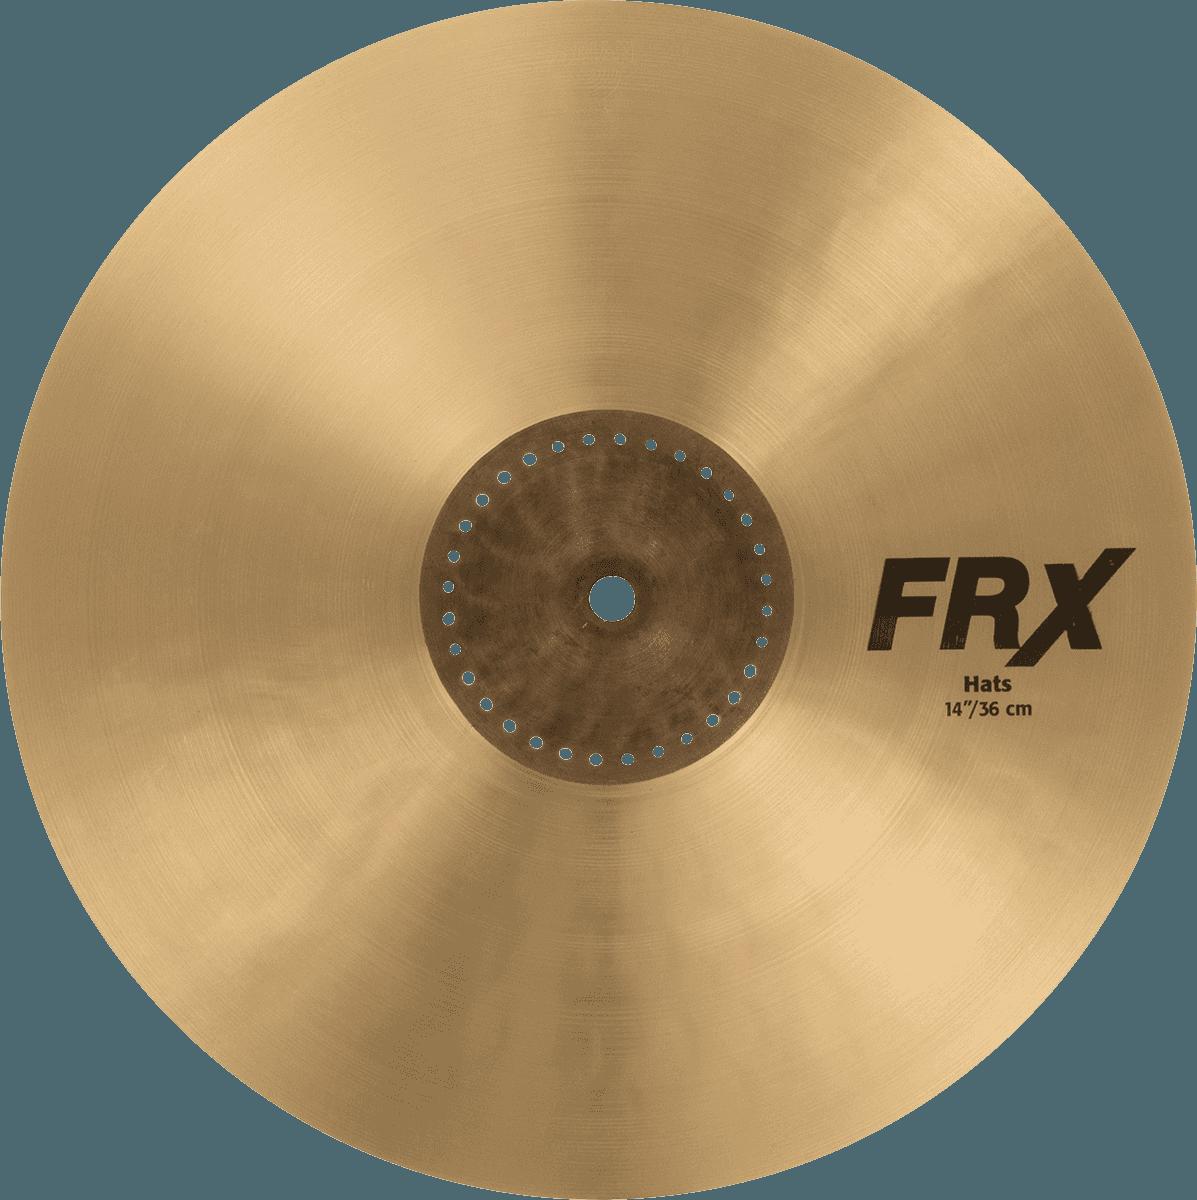 SABIAN 14  FRX hi-hat- PSA FRX1402